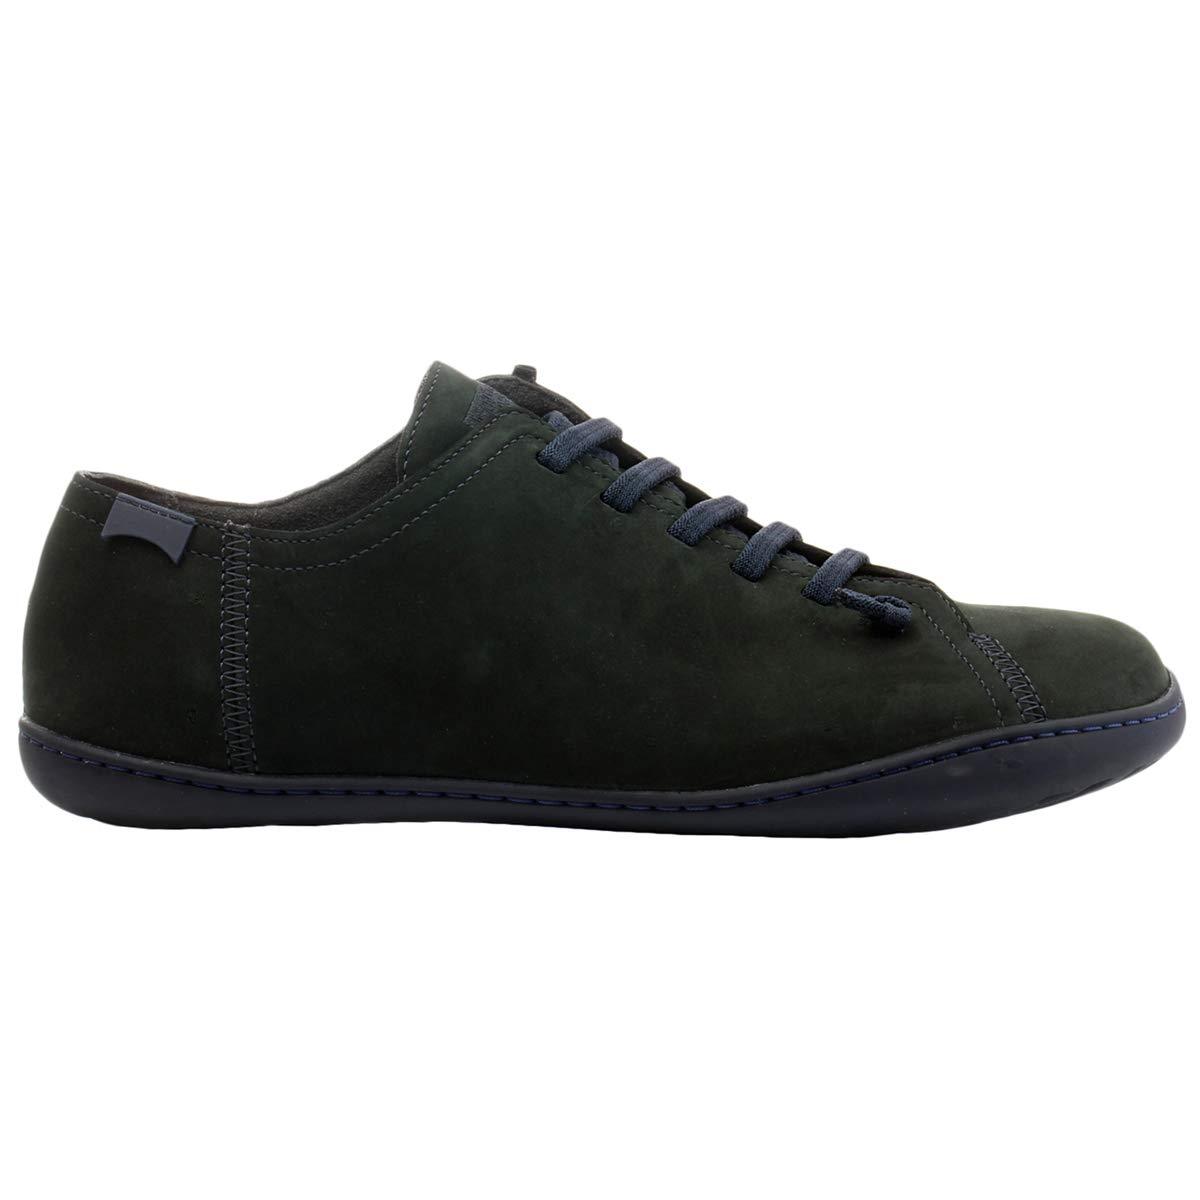 Charcoal Camper Mens Peu Cami Leather shoes